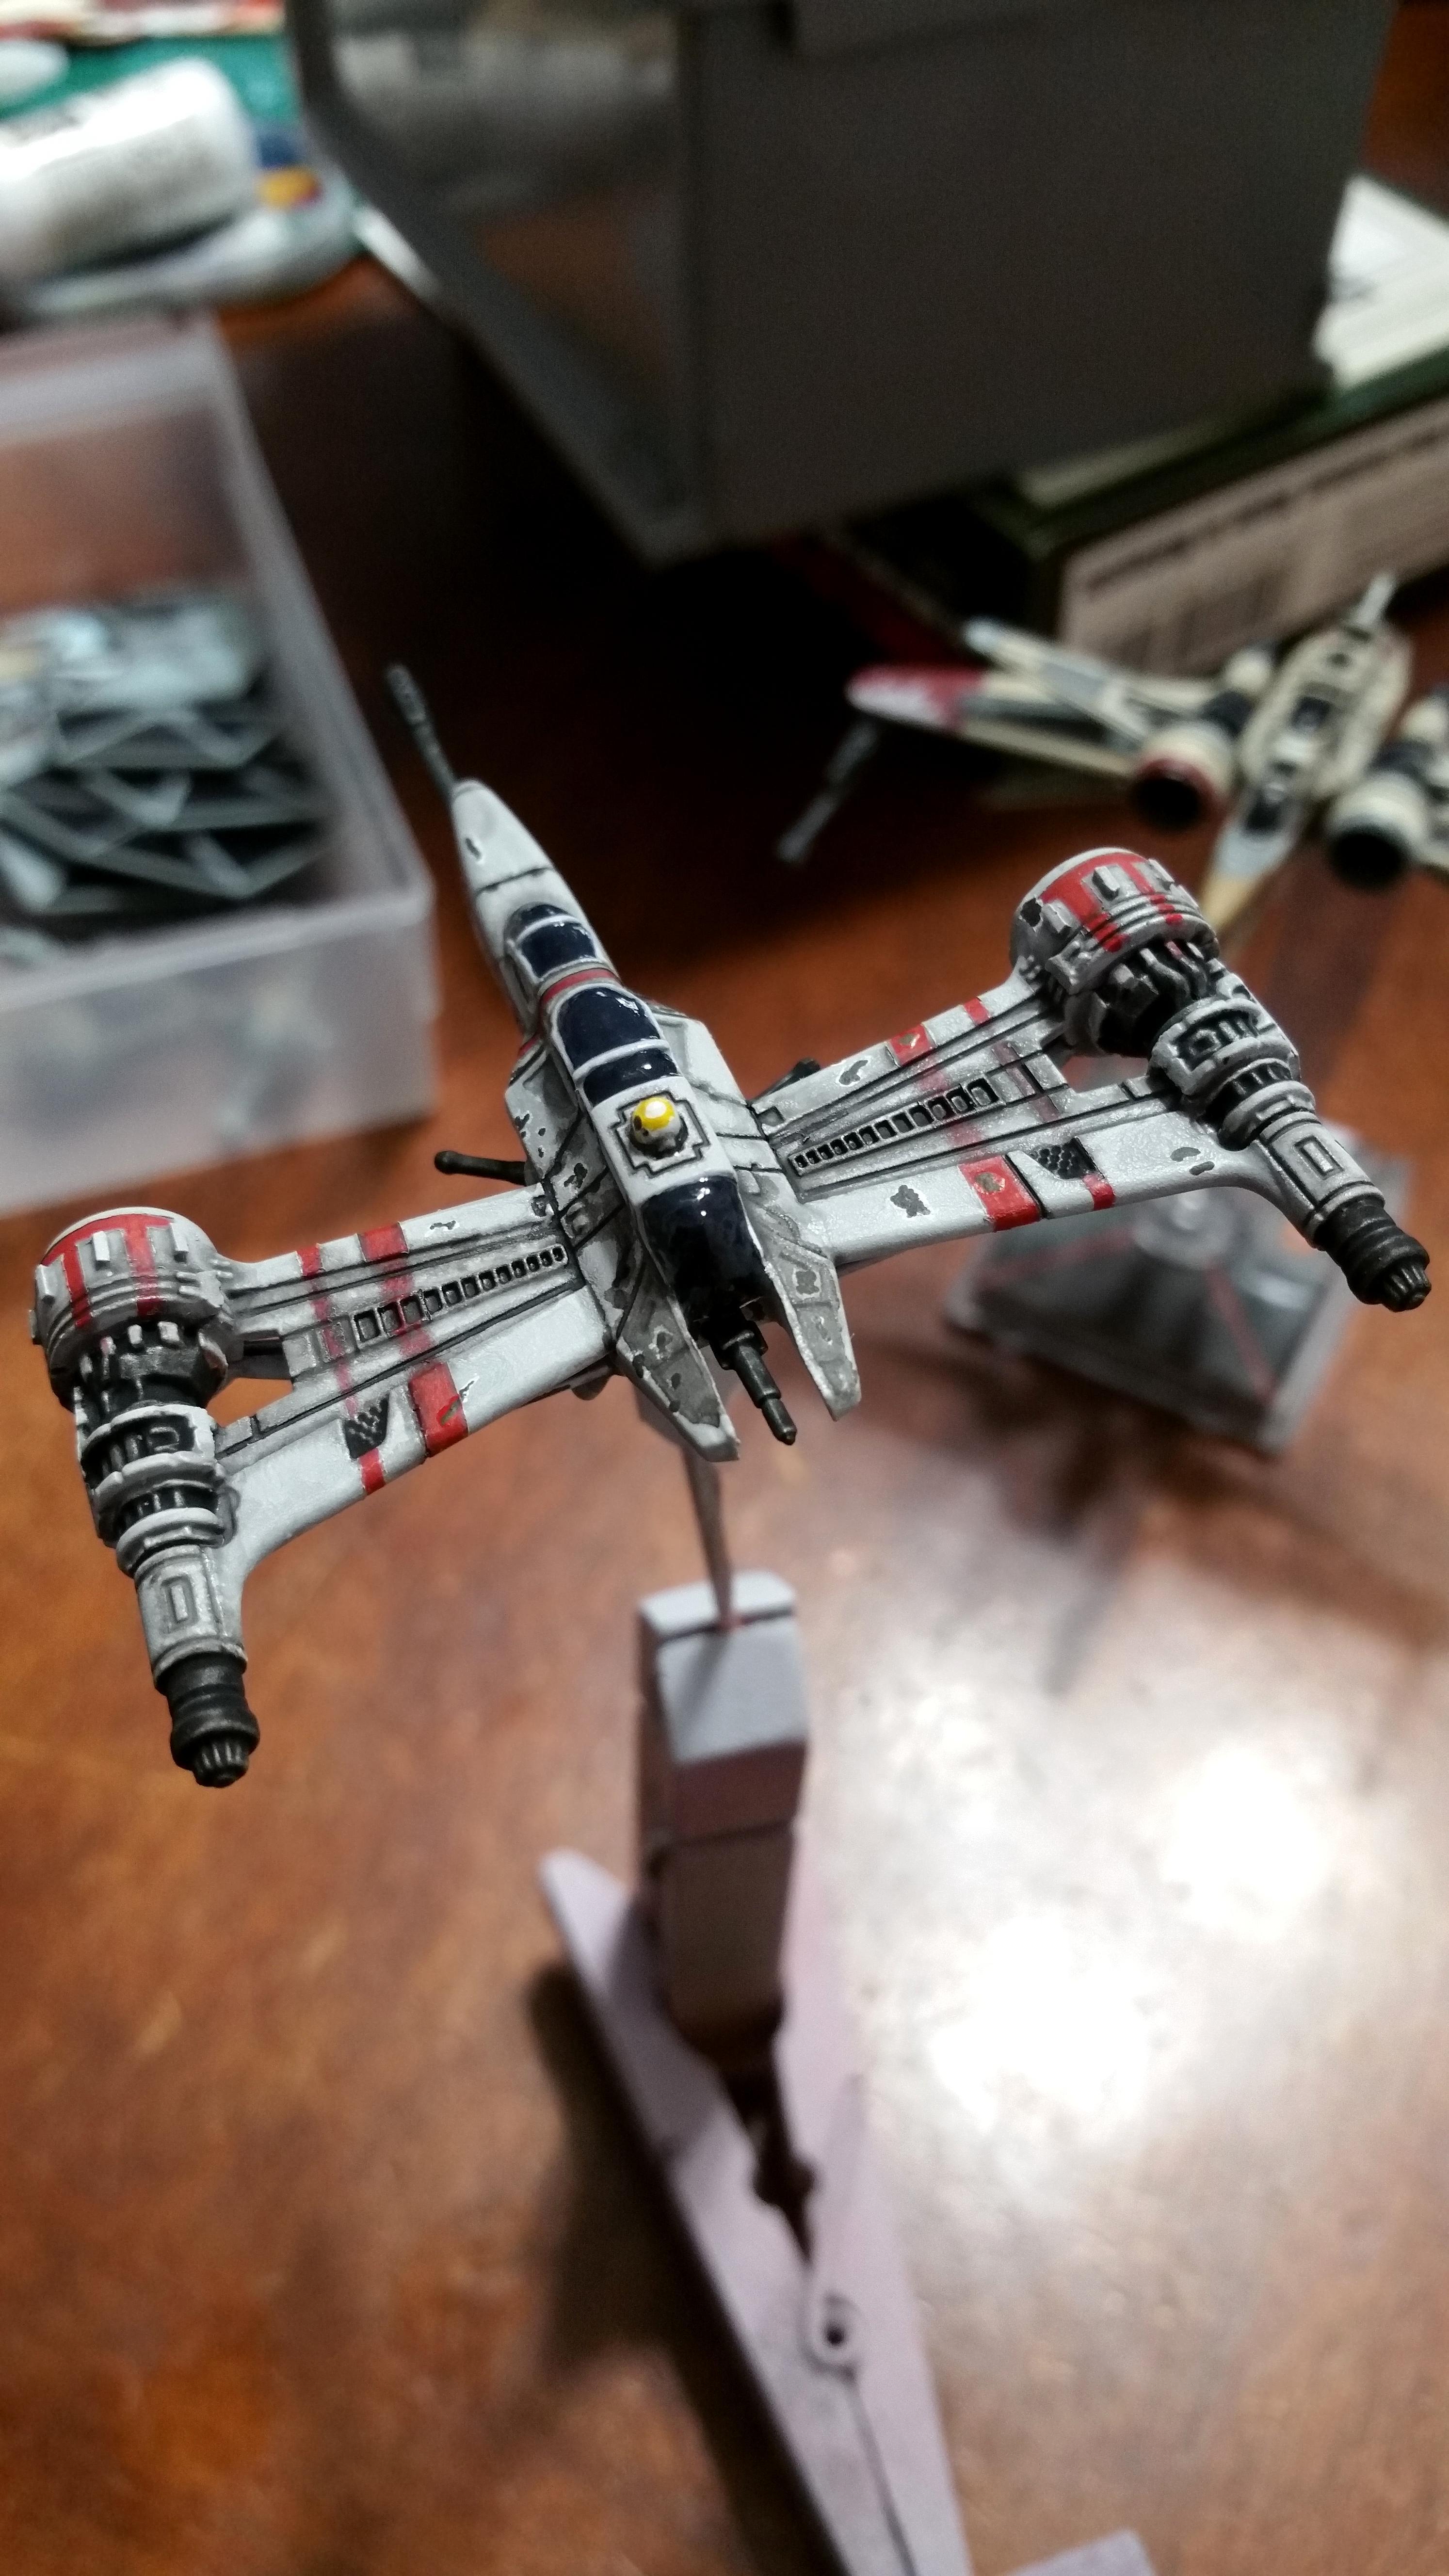 1/270, 170, 1:270, Arc, Arc-170, Modification, Repaint, Star Wars, X-wing Miniature Game